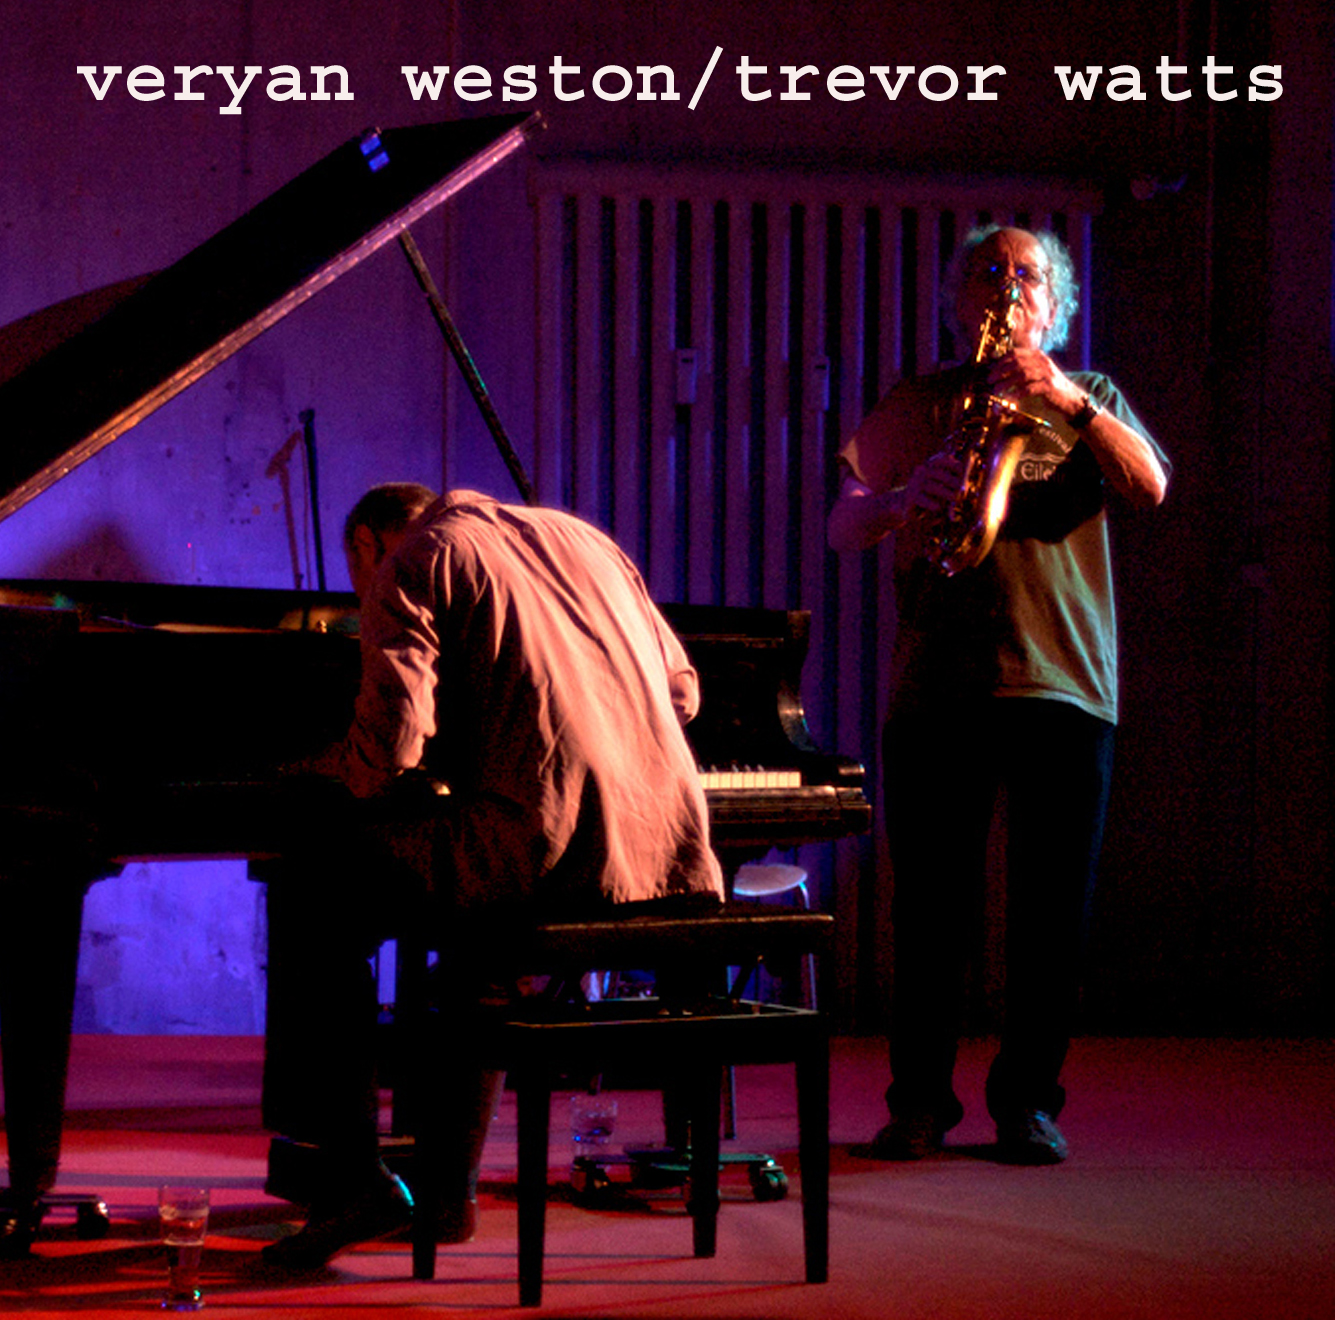 Trevor Watts Veryan Weston - Dialogues Project